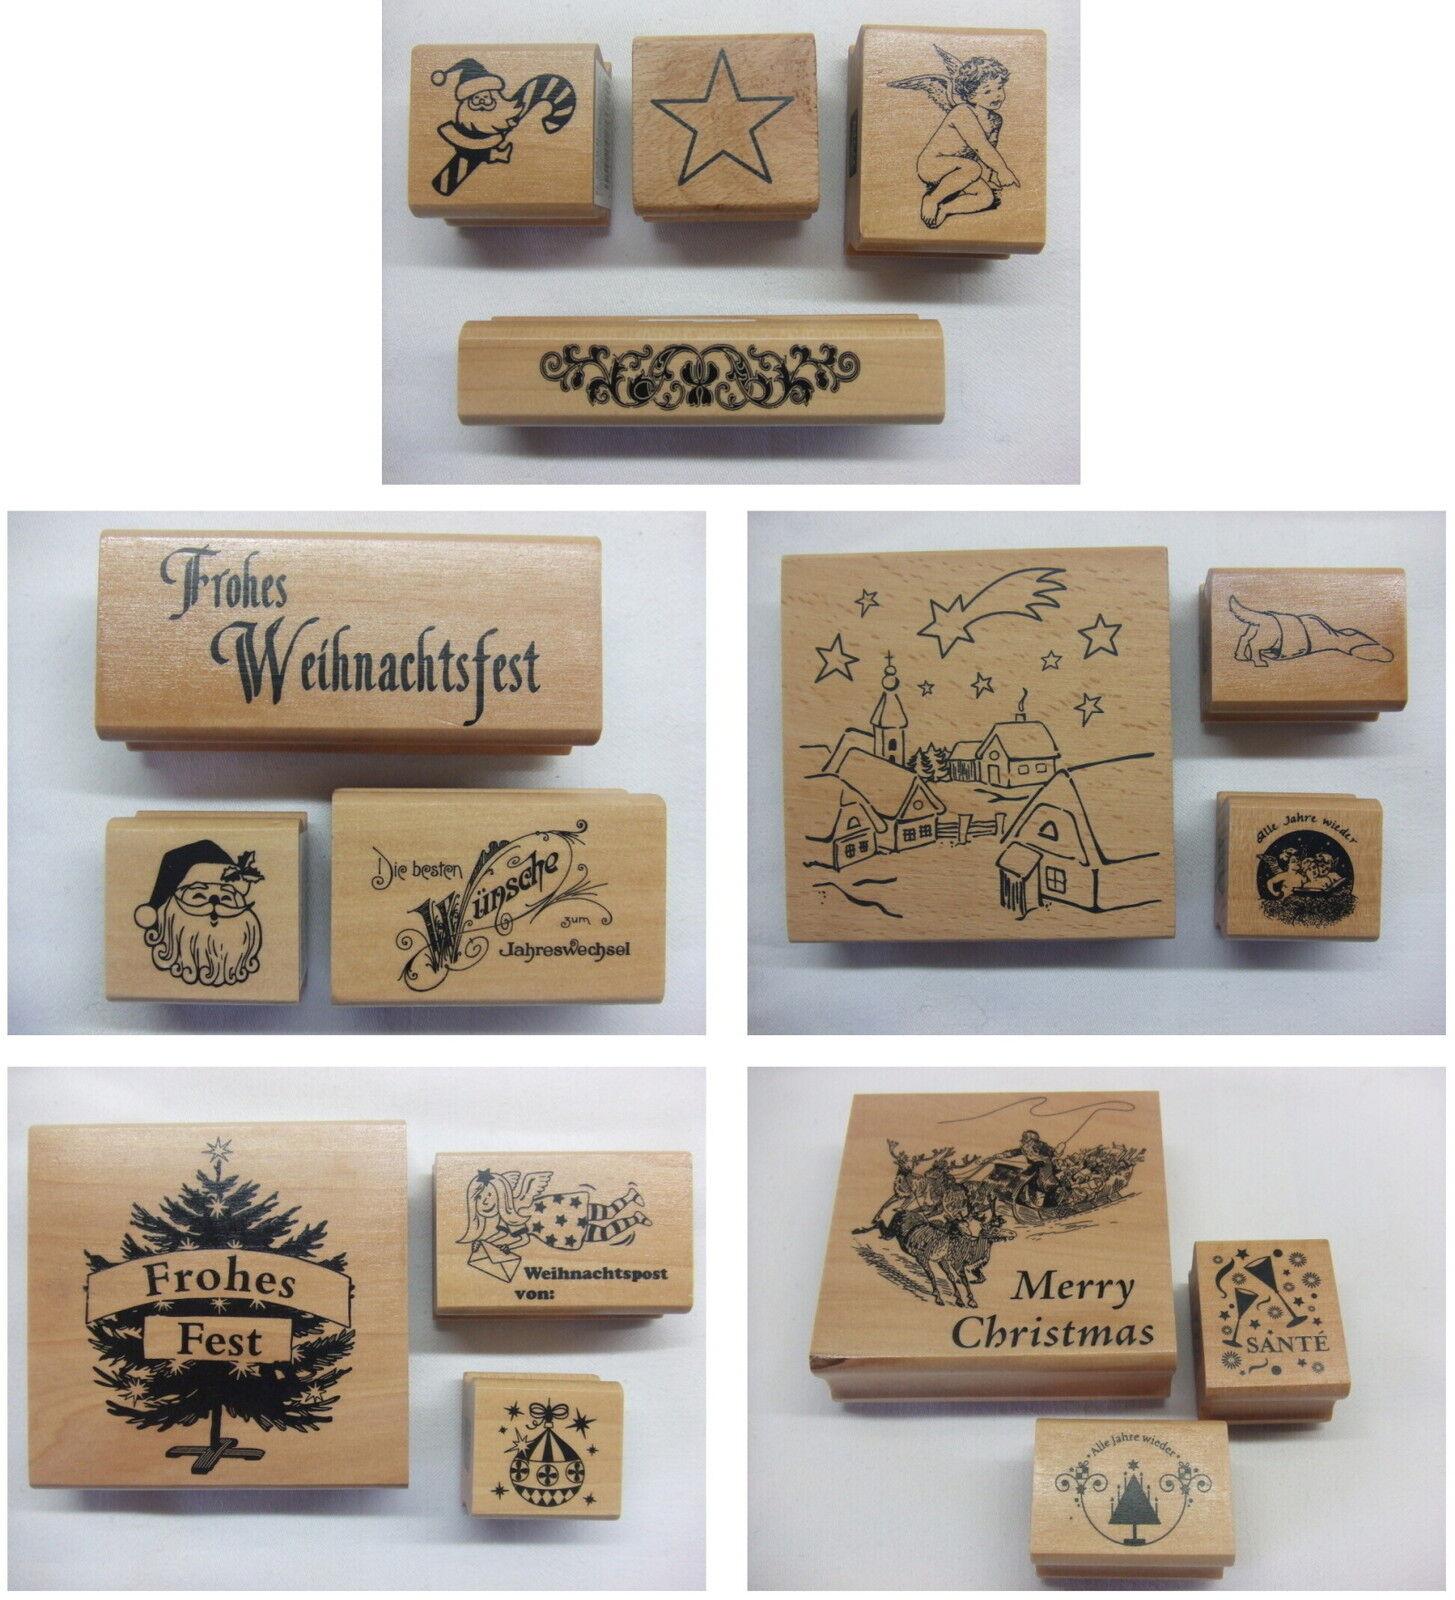 Holzstempel mit Stempelkissen zum Basteln f/ür Kinder Rico Design Stempel-Set Handmade 7 Motive Stempel aus Holz DIY